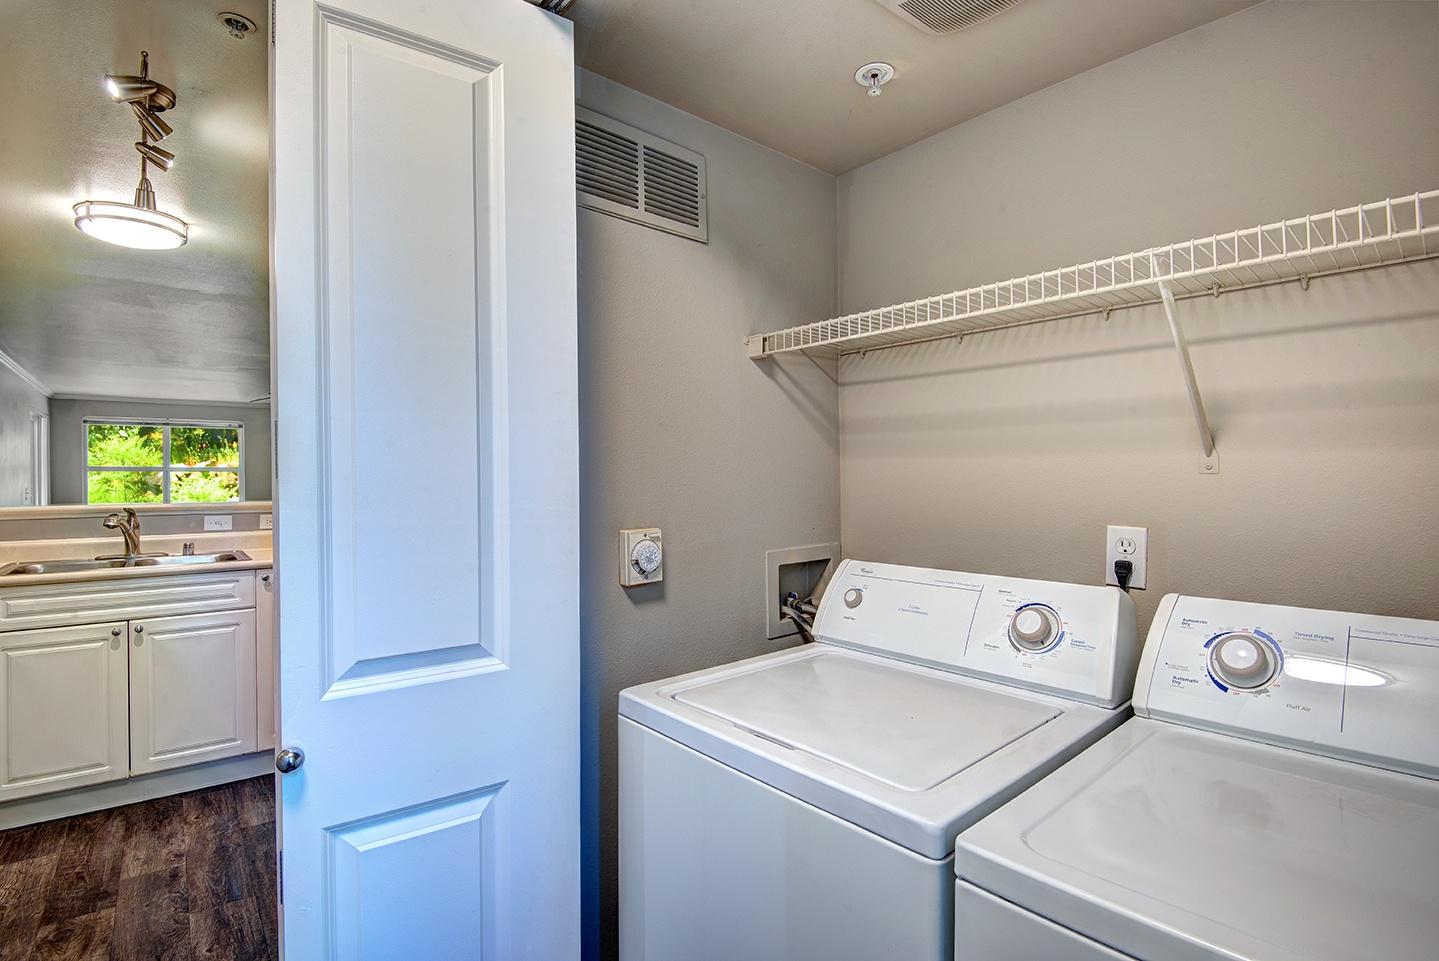 Full-size Washers & Dryers